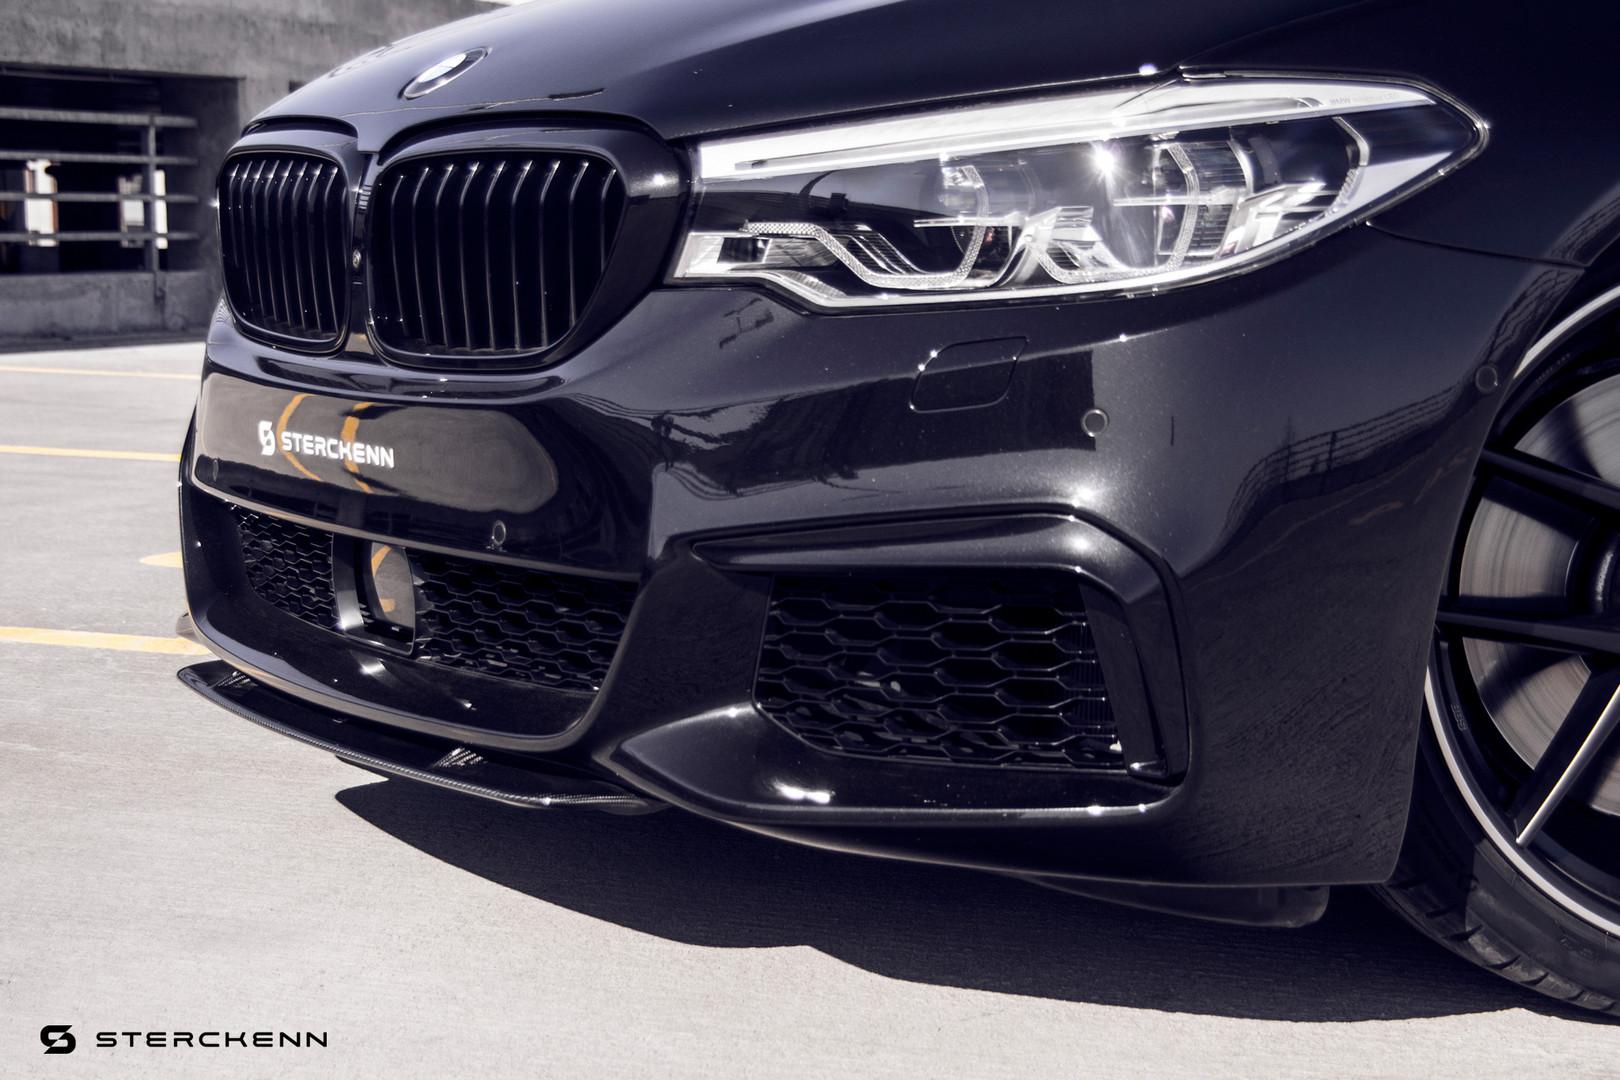 BMW-G30-5-Series-Headlights